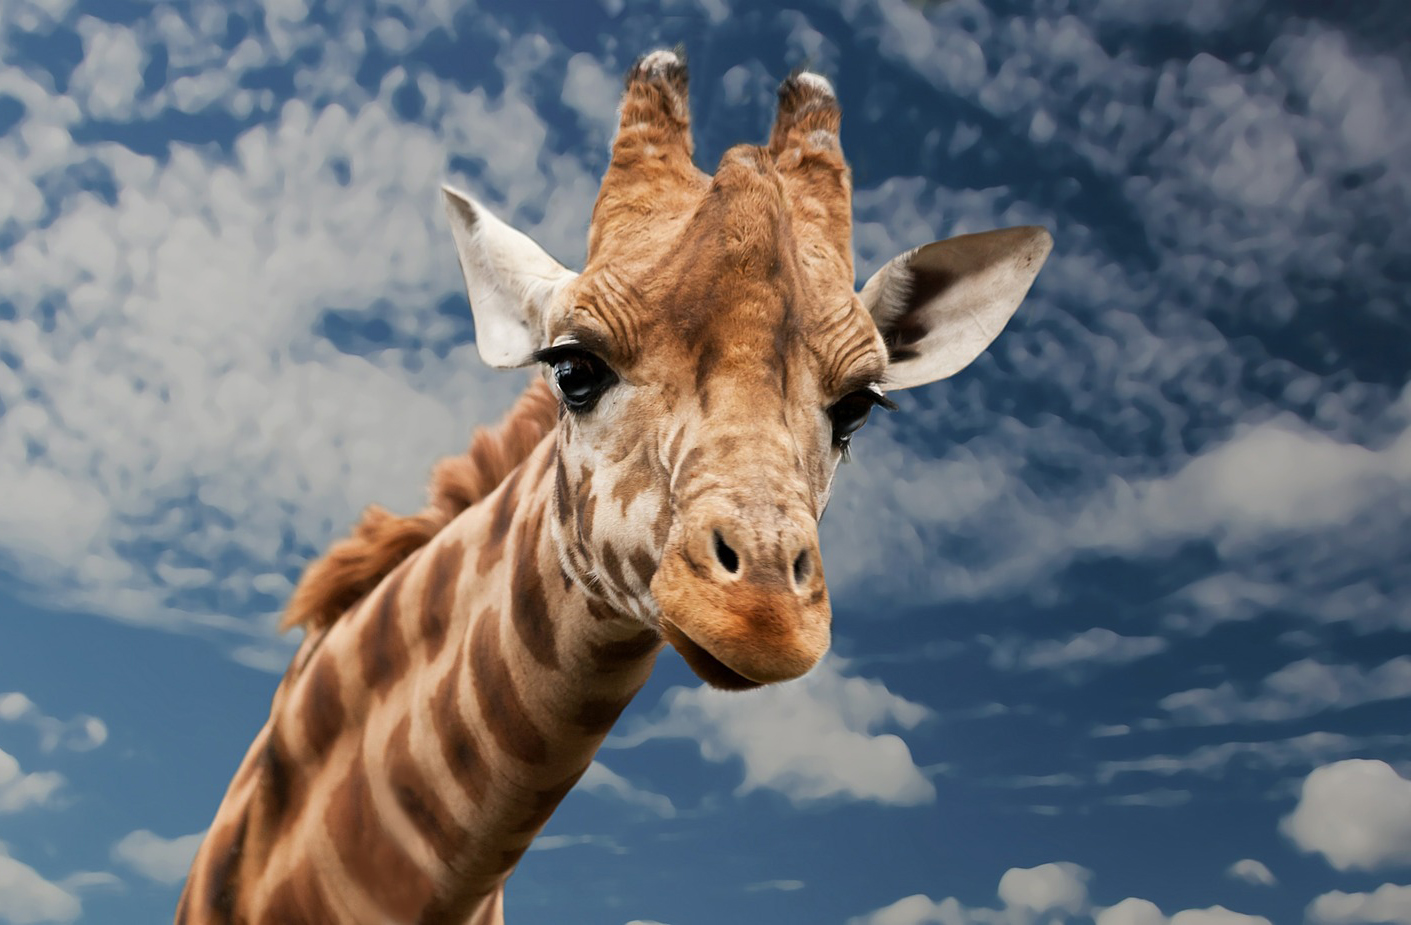 giraffe-614141_1920